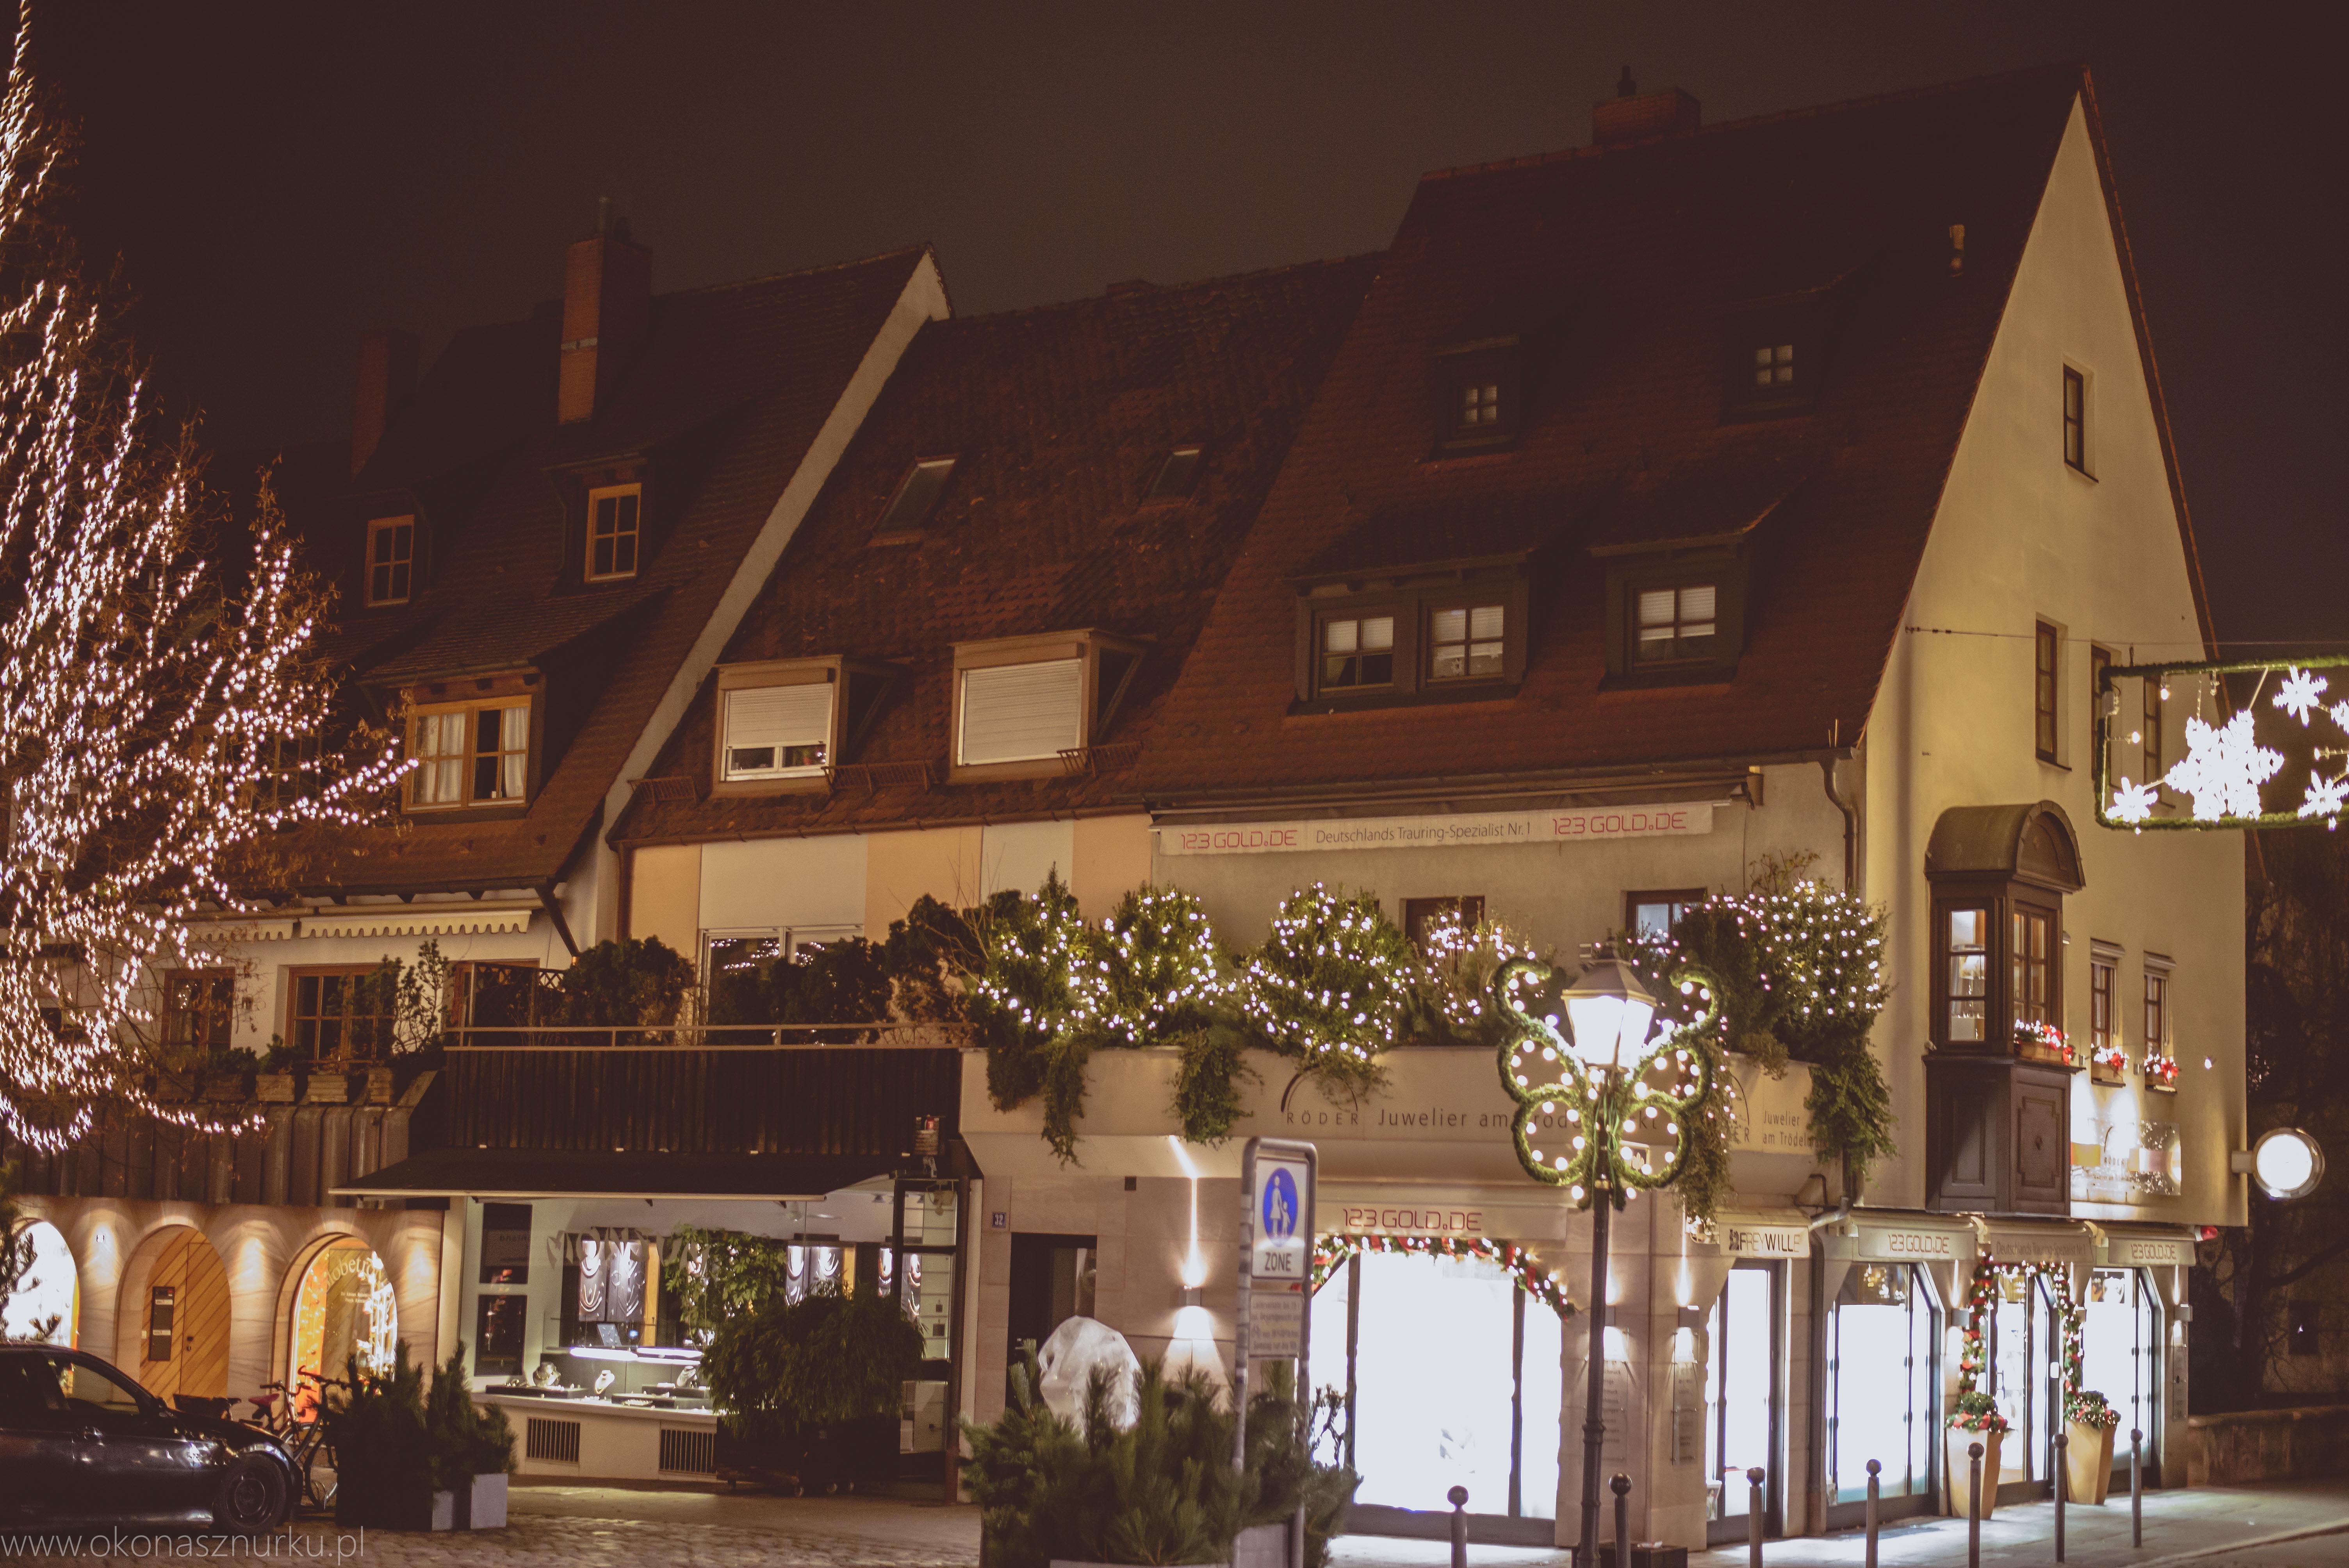 Nürnberg-stadt-norymberga-bayern-city-frankonia (3)